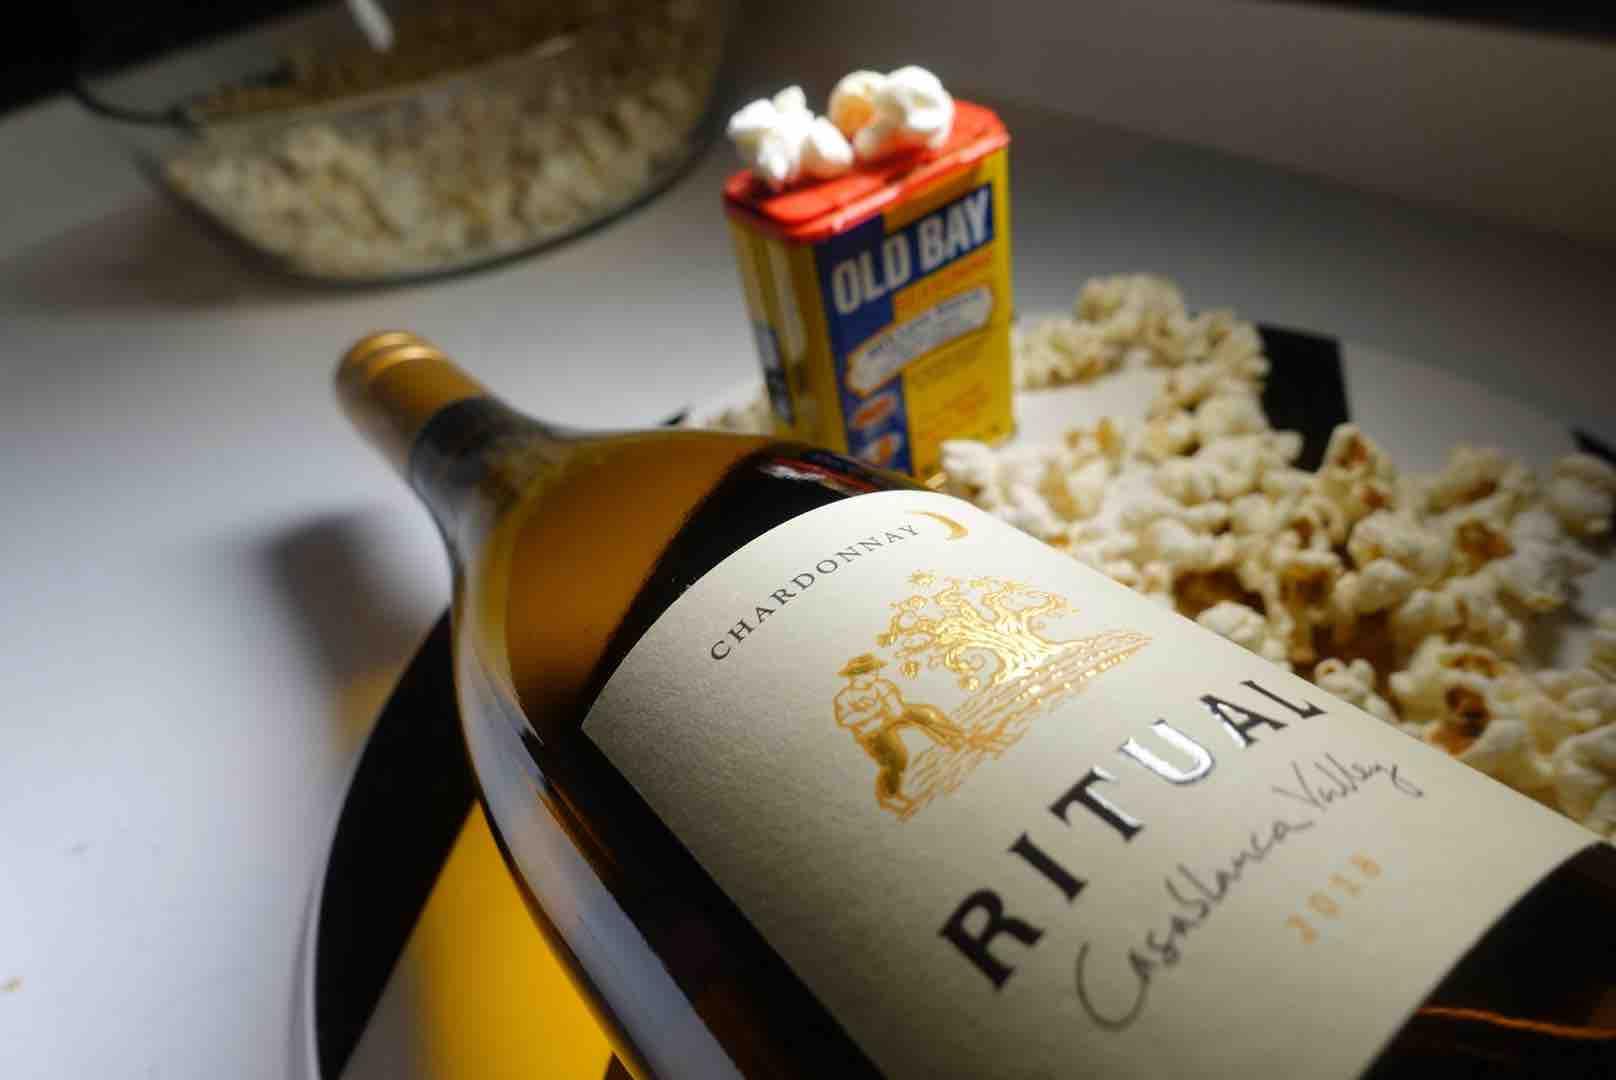 This Ritual Chardonnay Best Wine And Popcorn Pairings For Your Next Binge-Watching Night